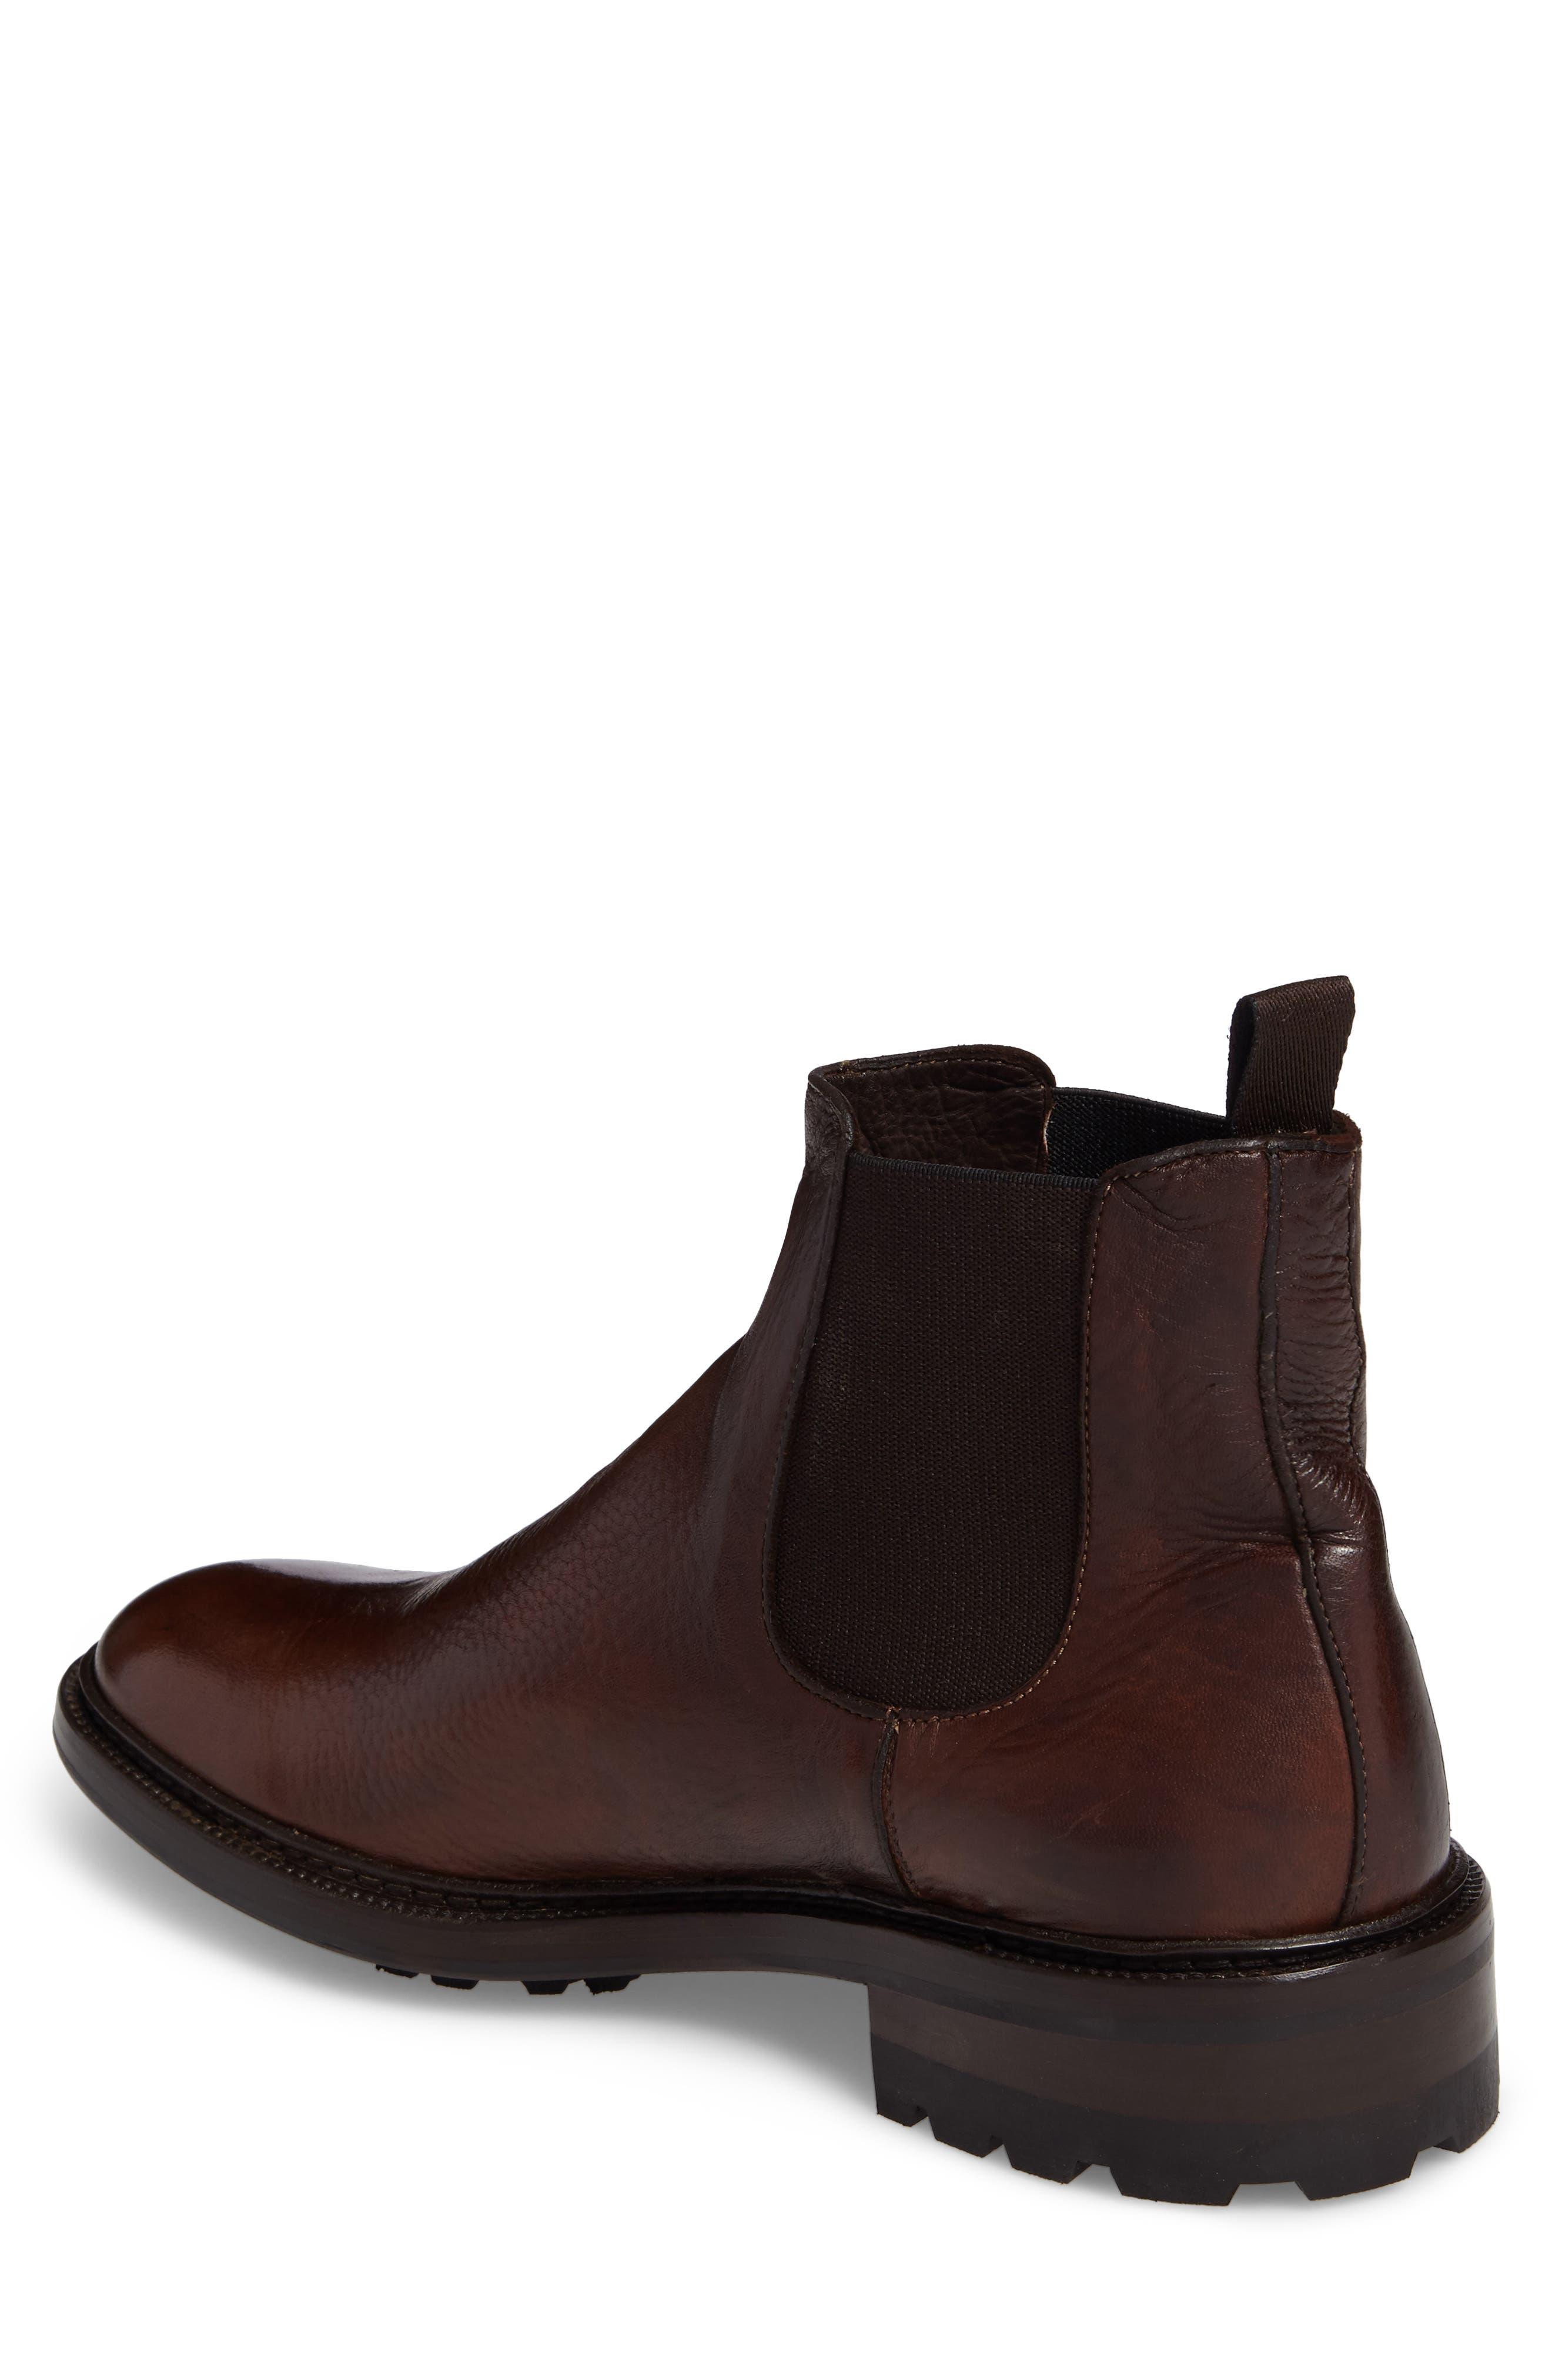 Greyson Chelsea Boot,                             Alternate thumbnail 2, color,                             Cognac